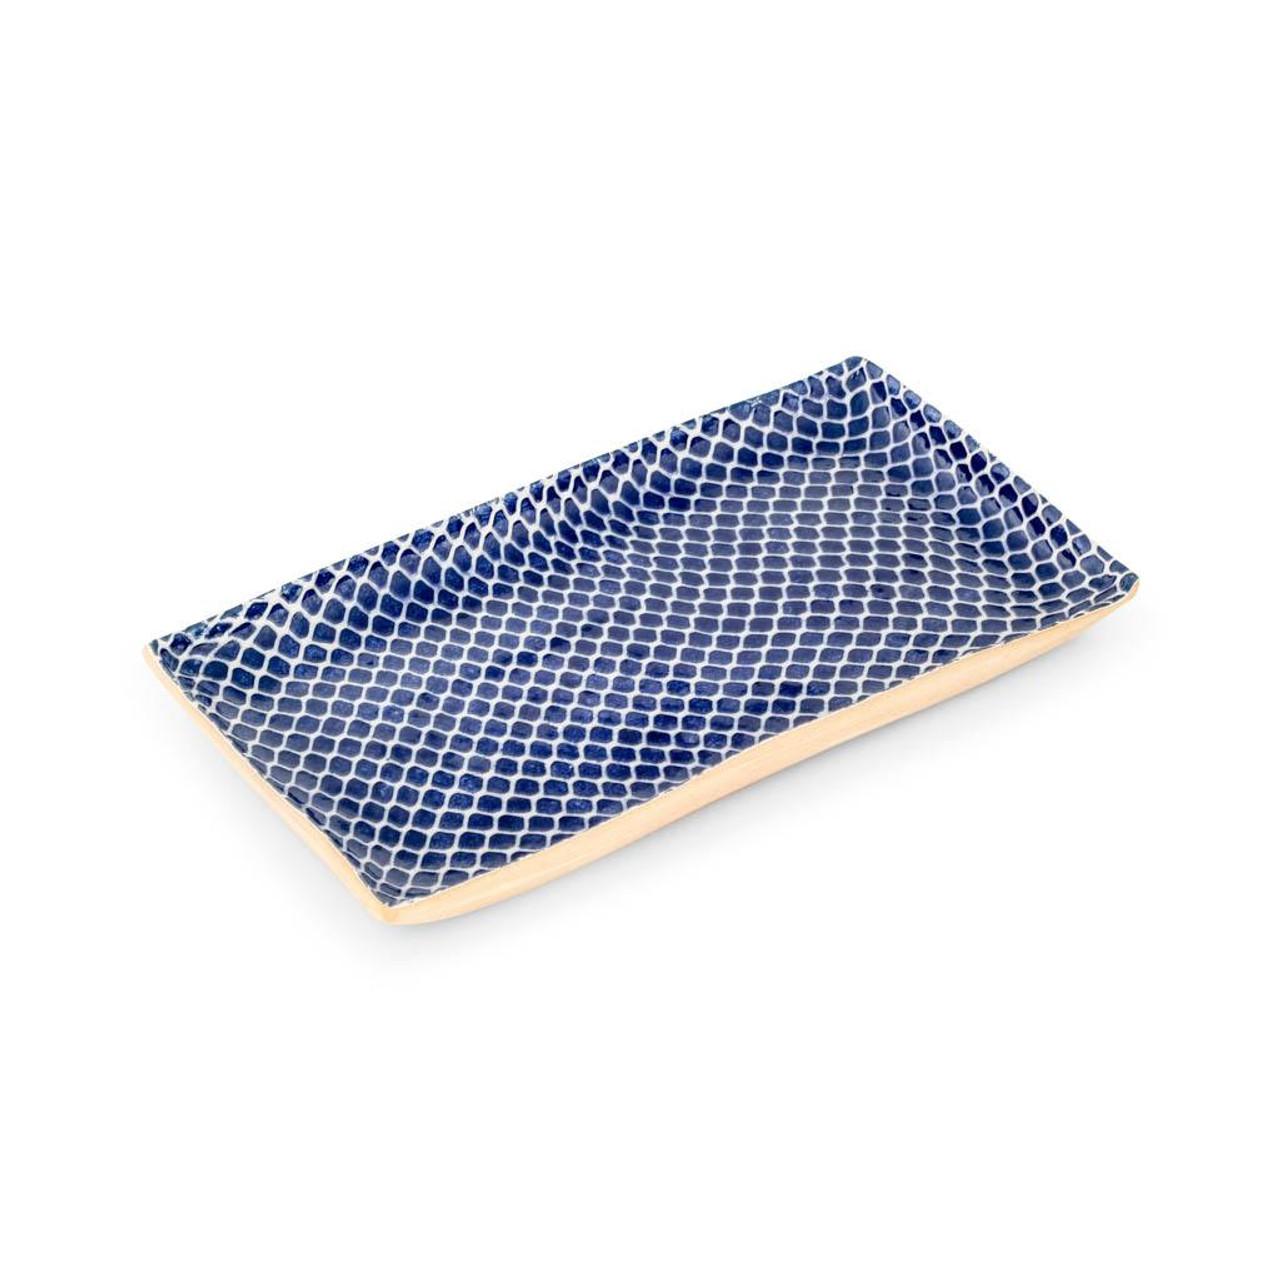 Terrafirma Ceramics - Handmade Ceramic Stacking Serving Platter Taj Cobalt (Medium)